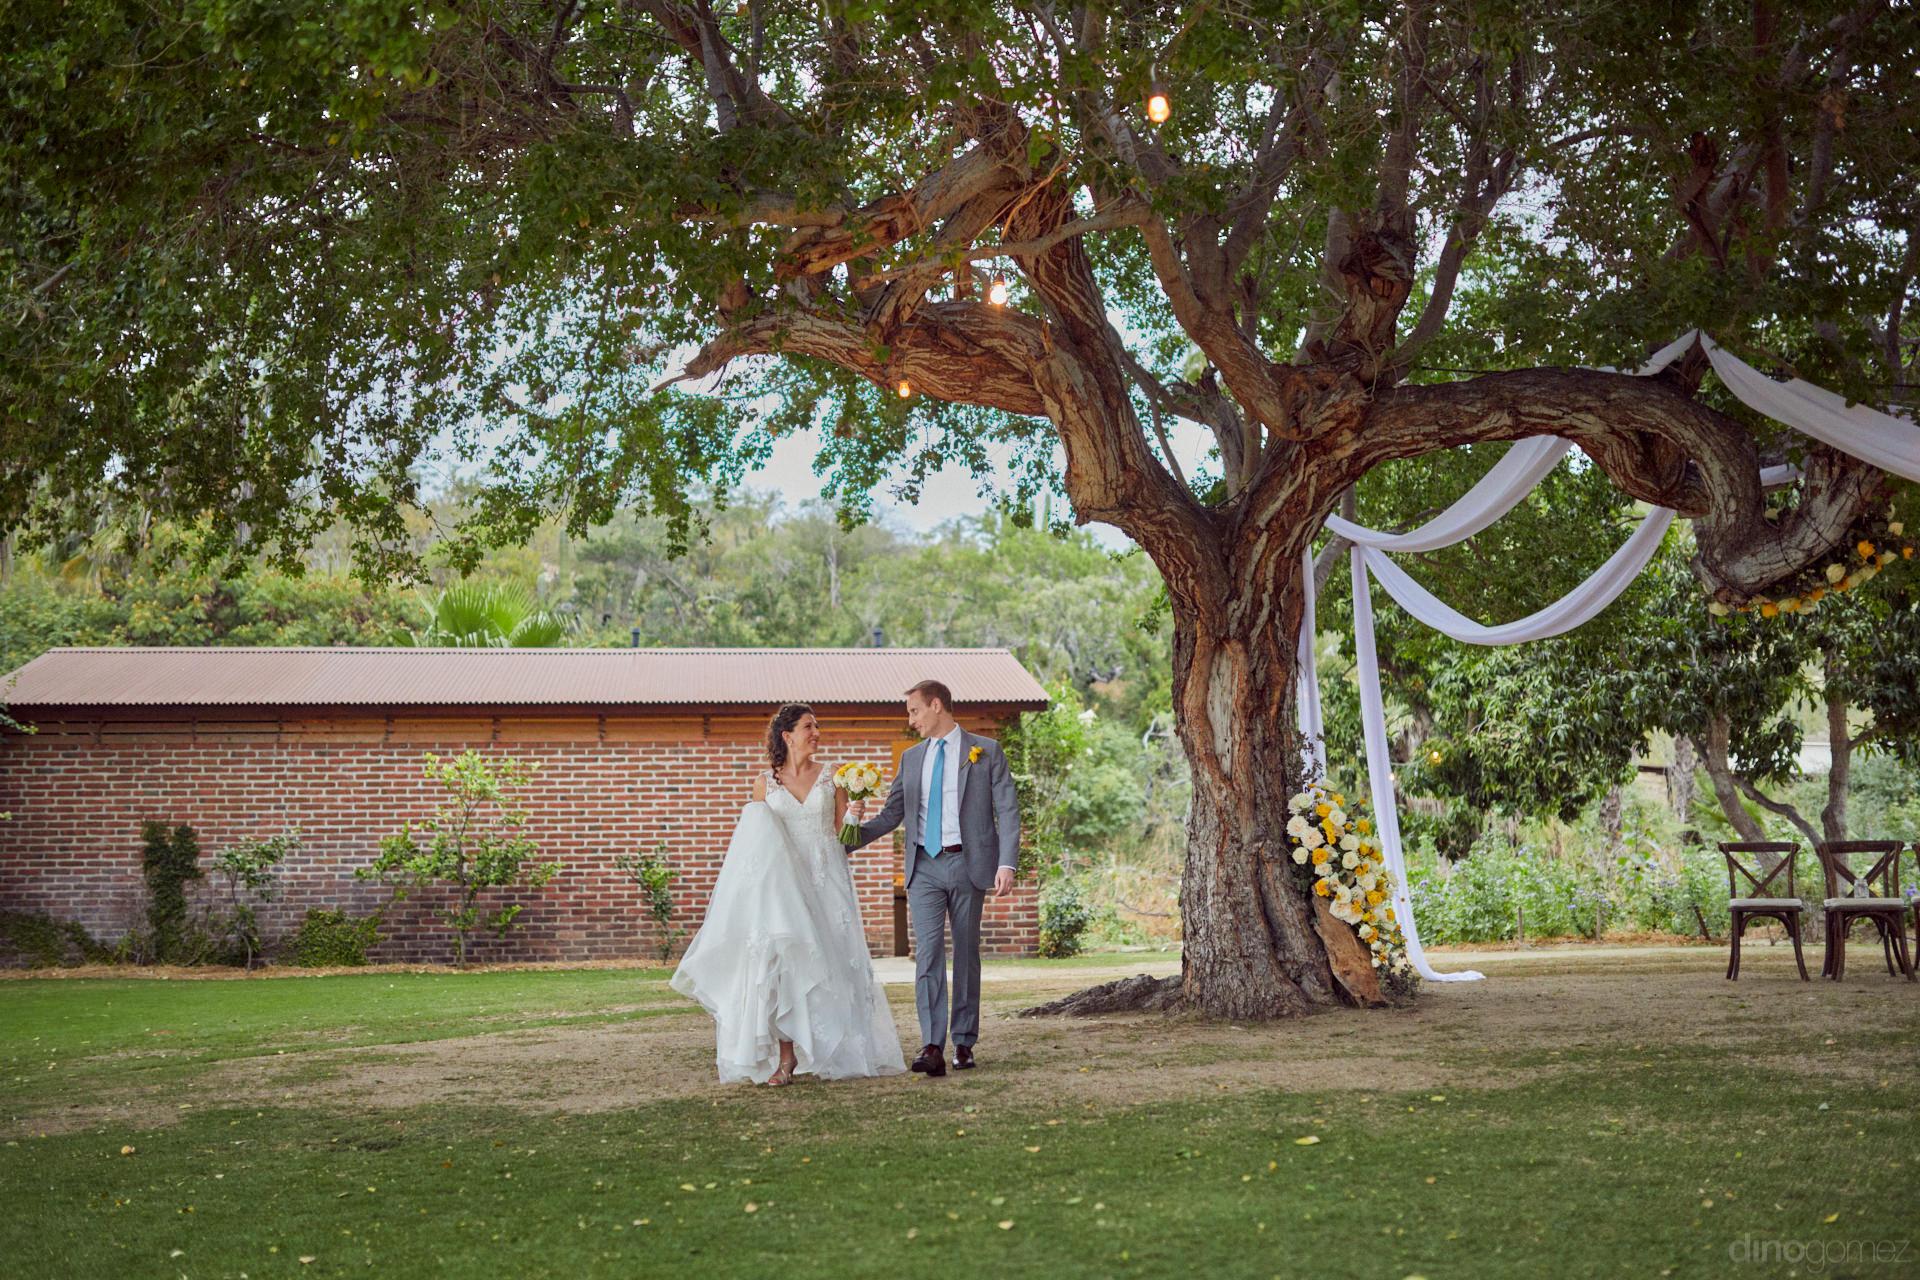 Wedding Photographers In Cabo San Lucas - Hilary & Bryan Flora Wedding